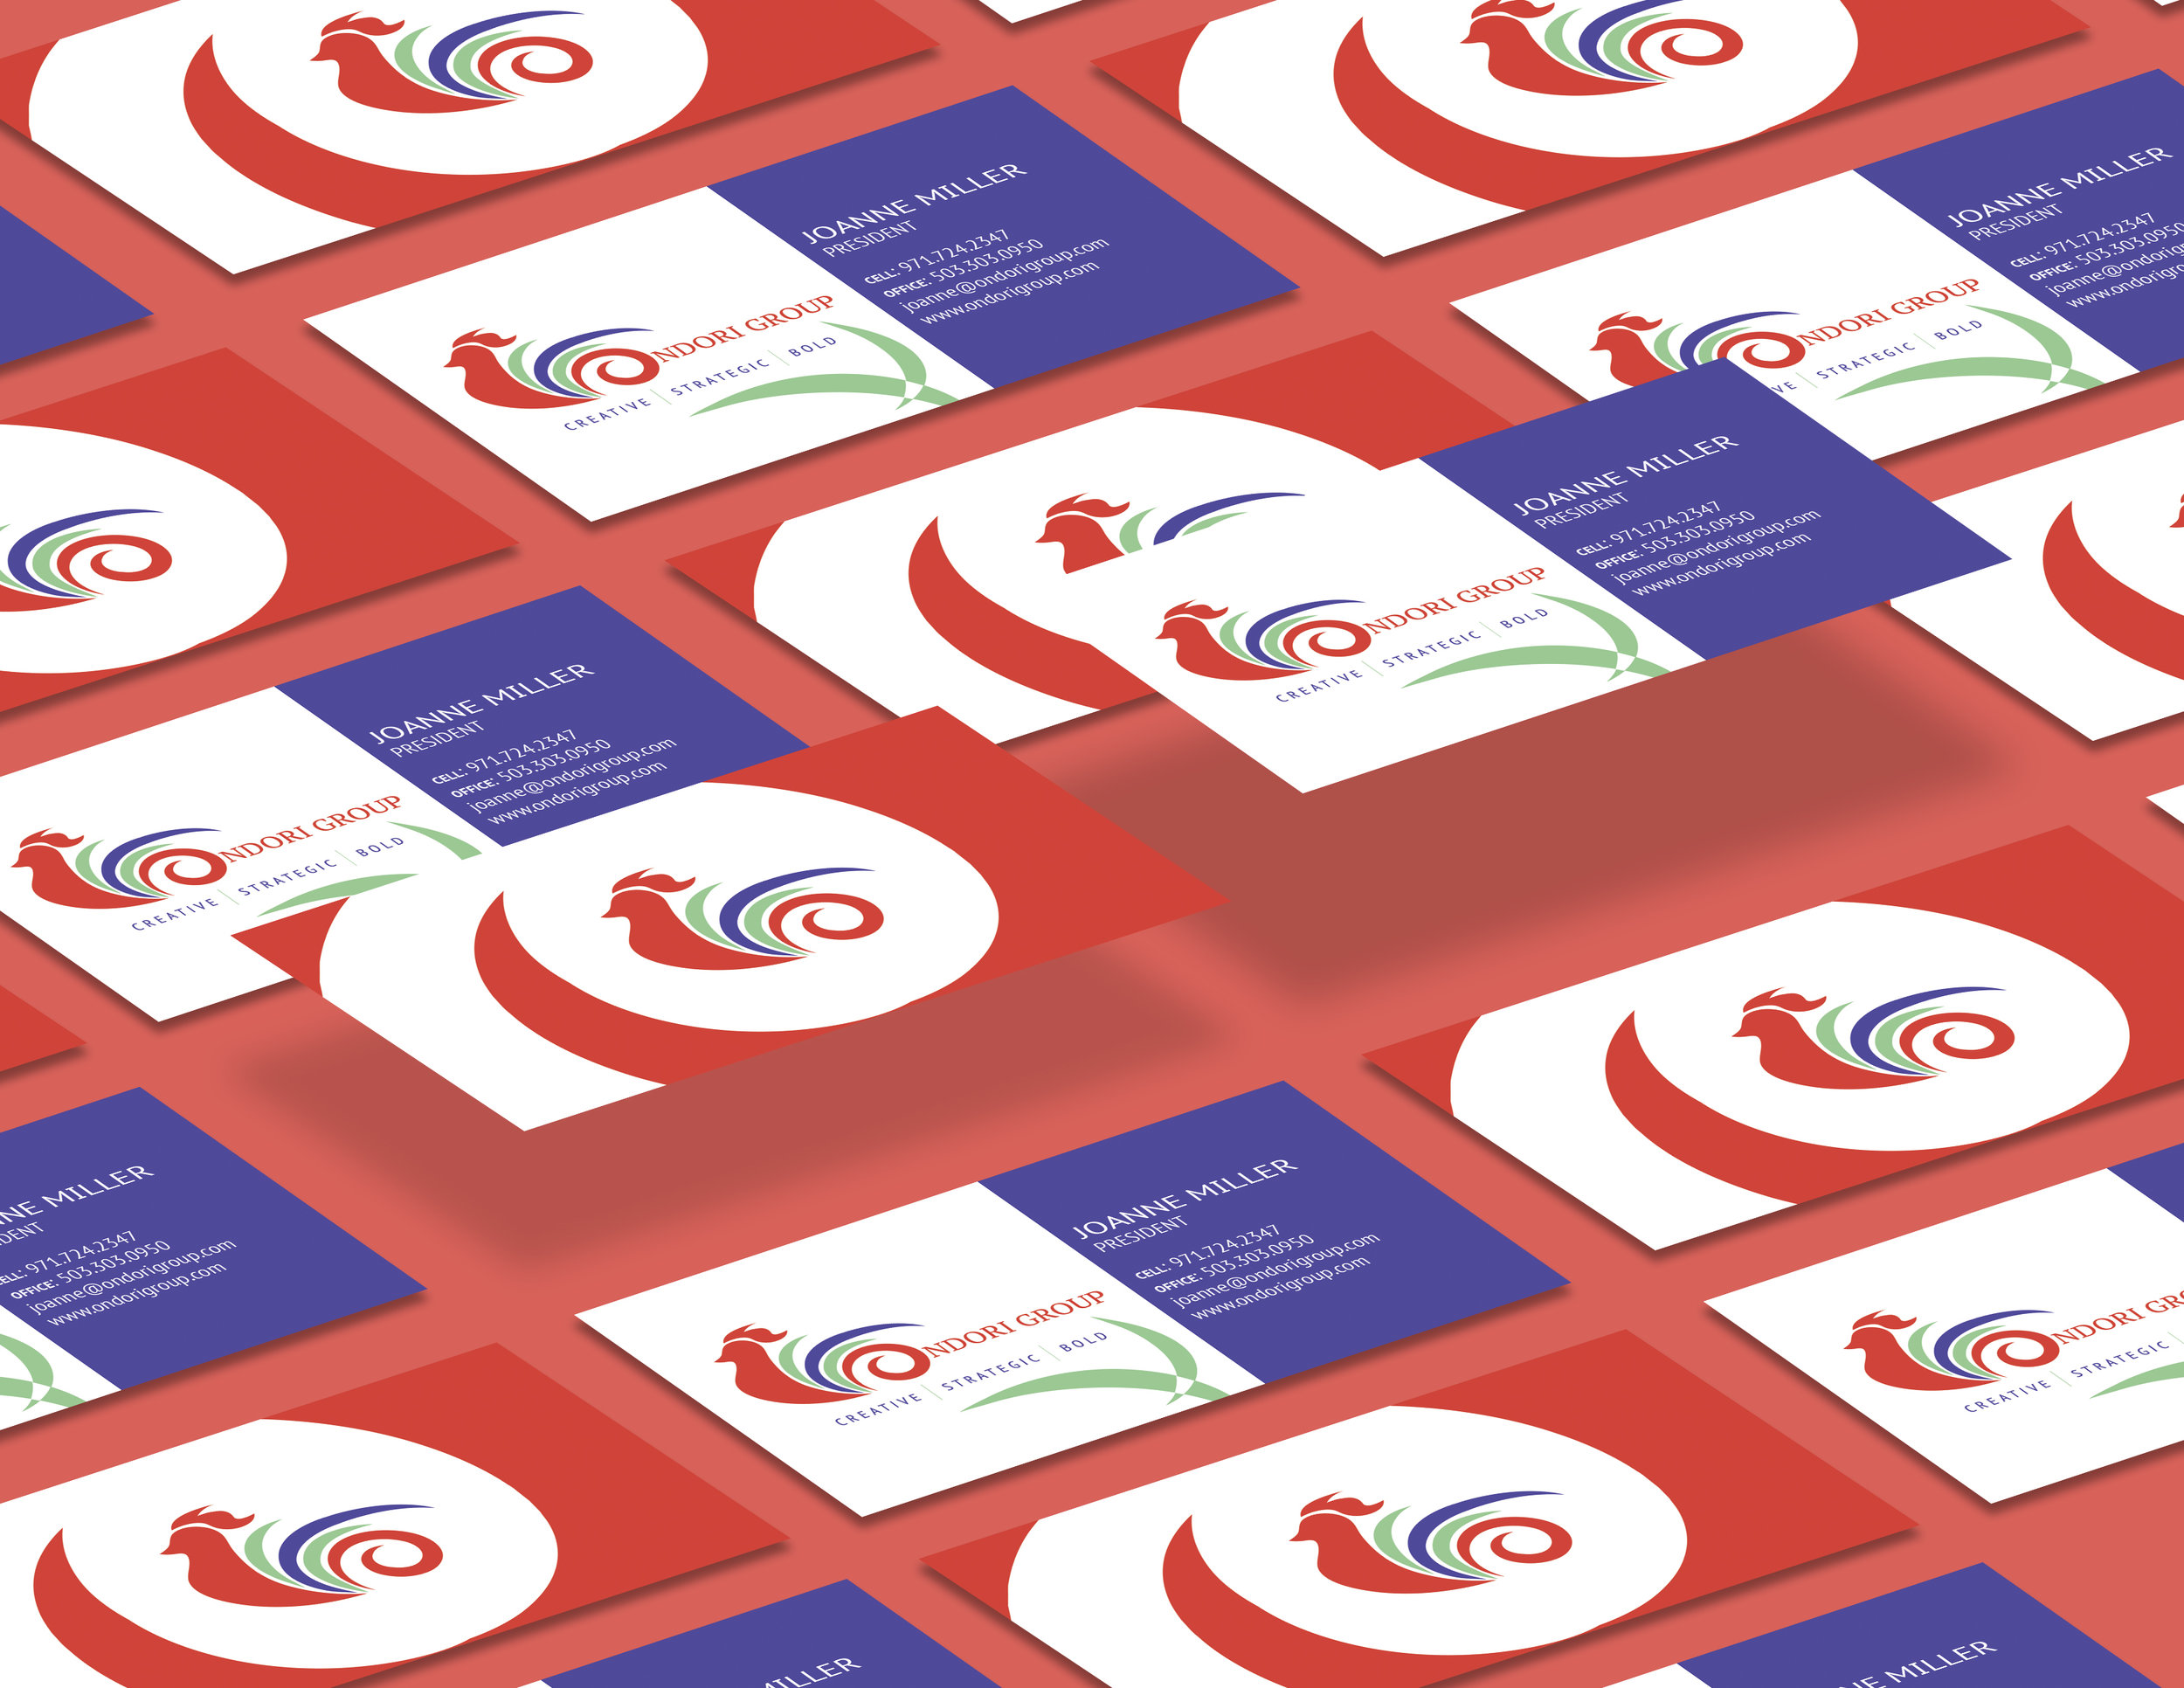 ONDORI_CARDS.jpg